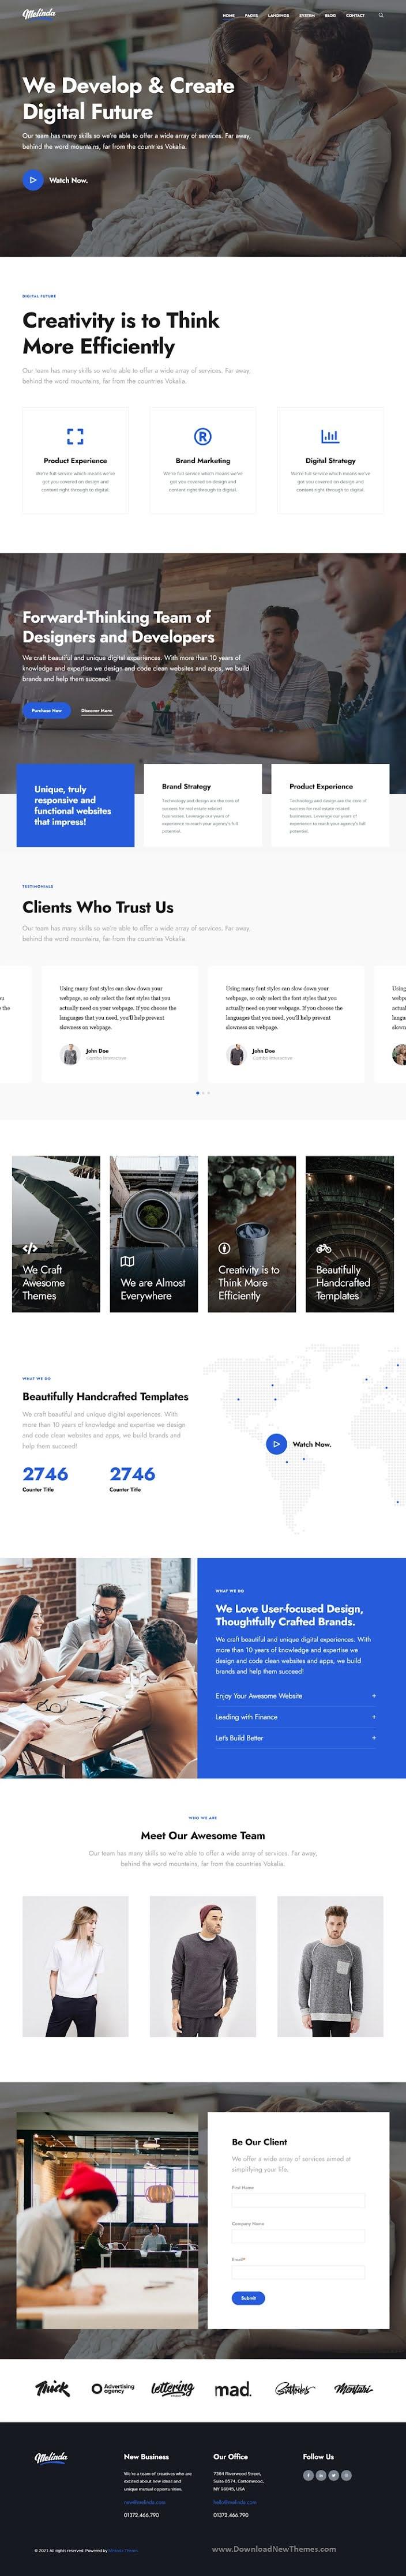 Melinda - Multi-Purpose HubSpot Theme